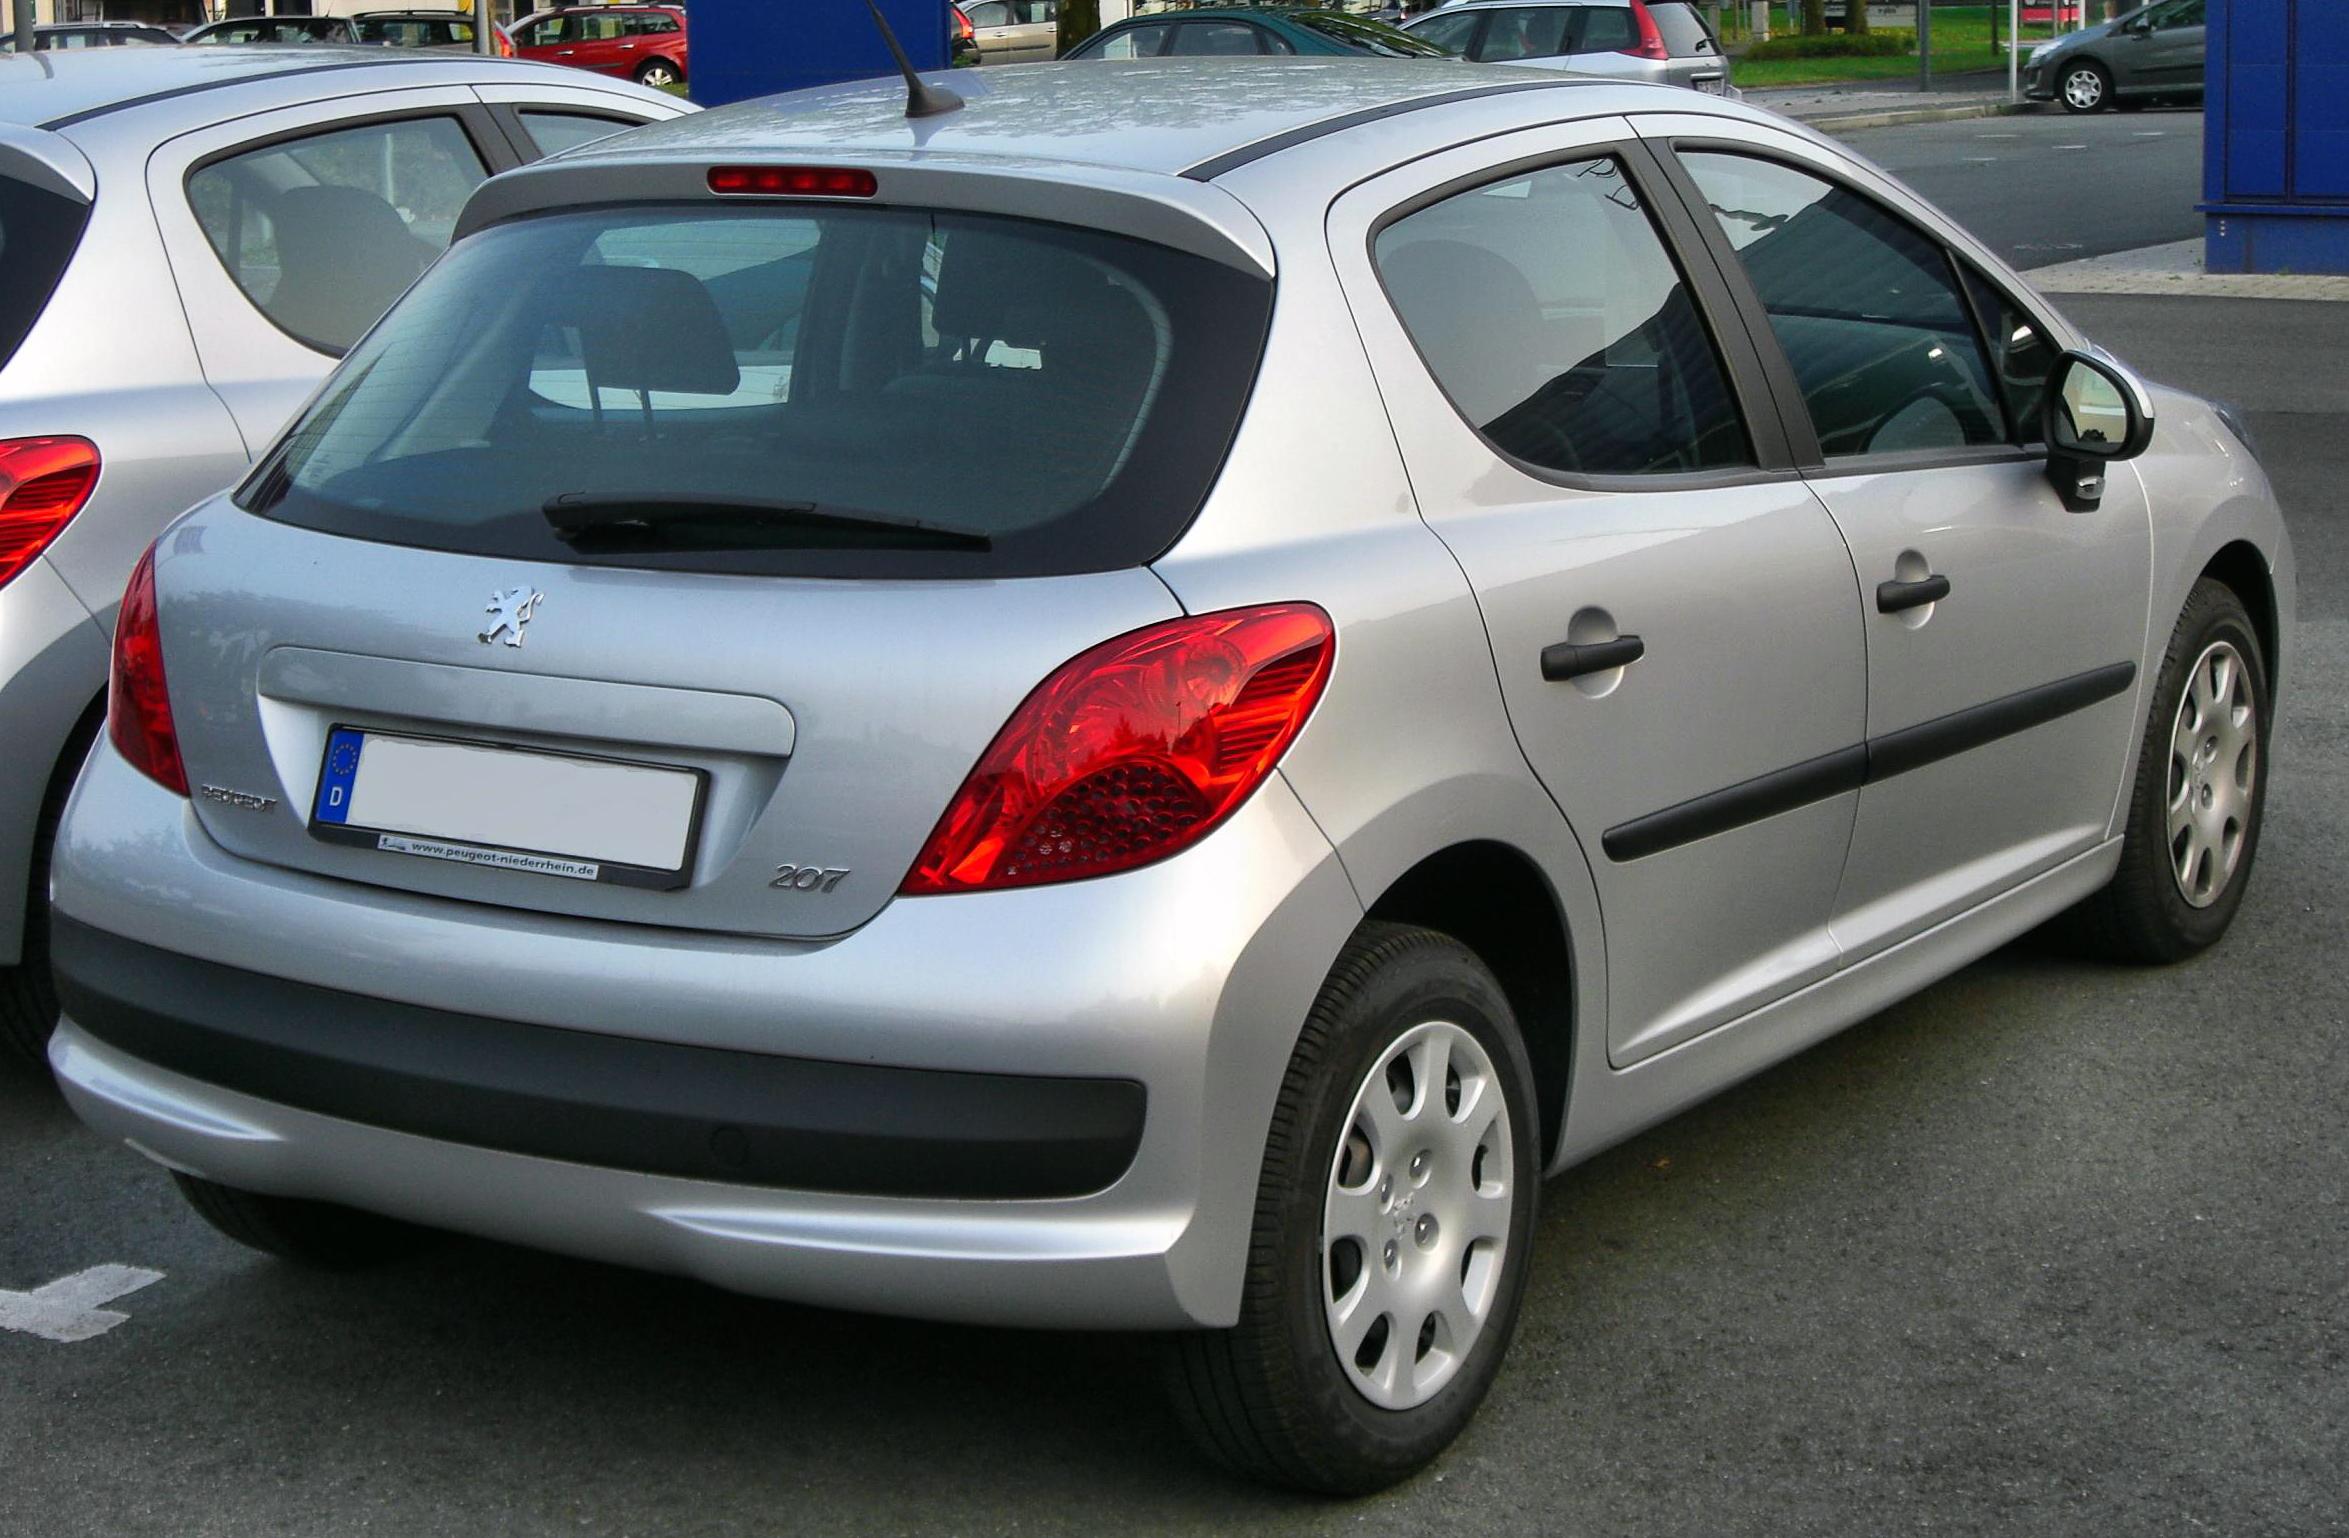 File:Peugeot 207 5-Türer rear.JPG - Wikimedia Commons